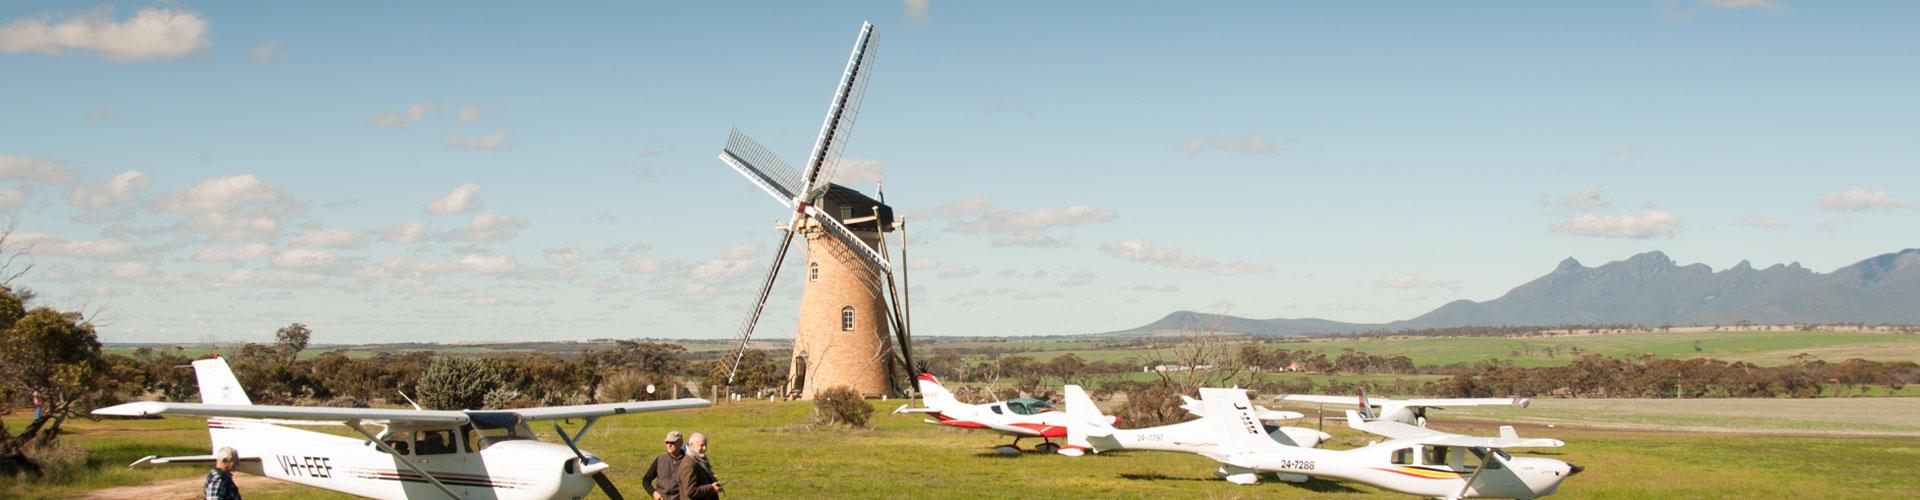 university-flying-club-jandakot-aircraft-hire-flight-training-modern-15